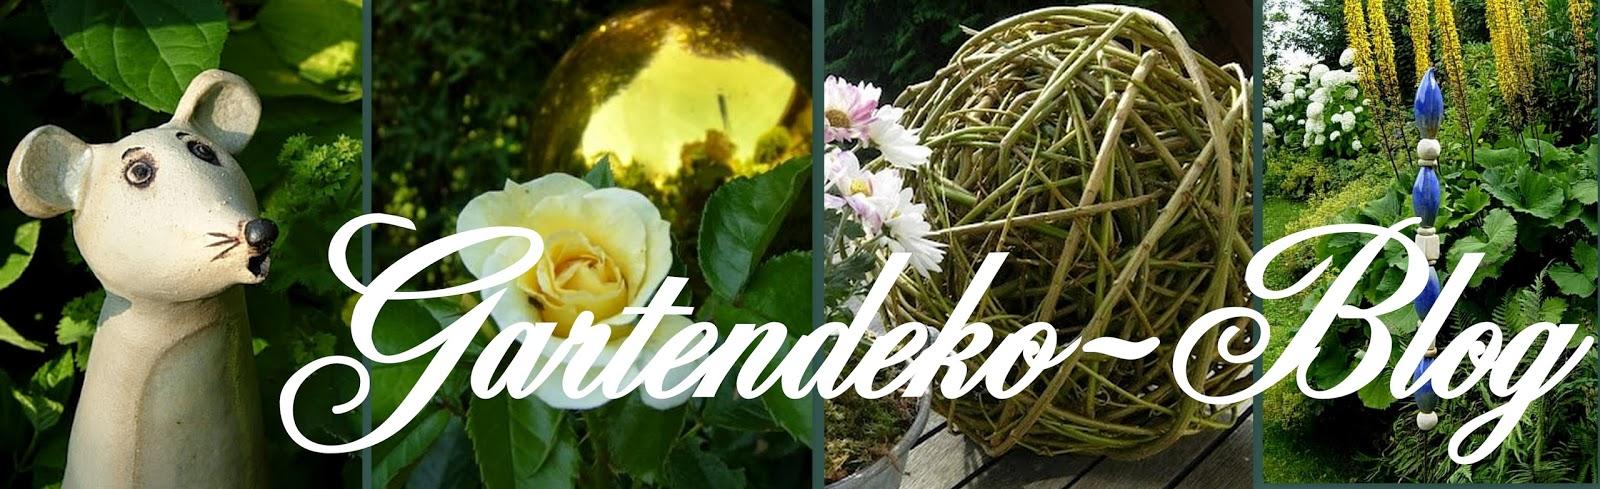 Gartendeko blog partnerblogs gesucht for Suche gartendeko